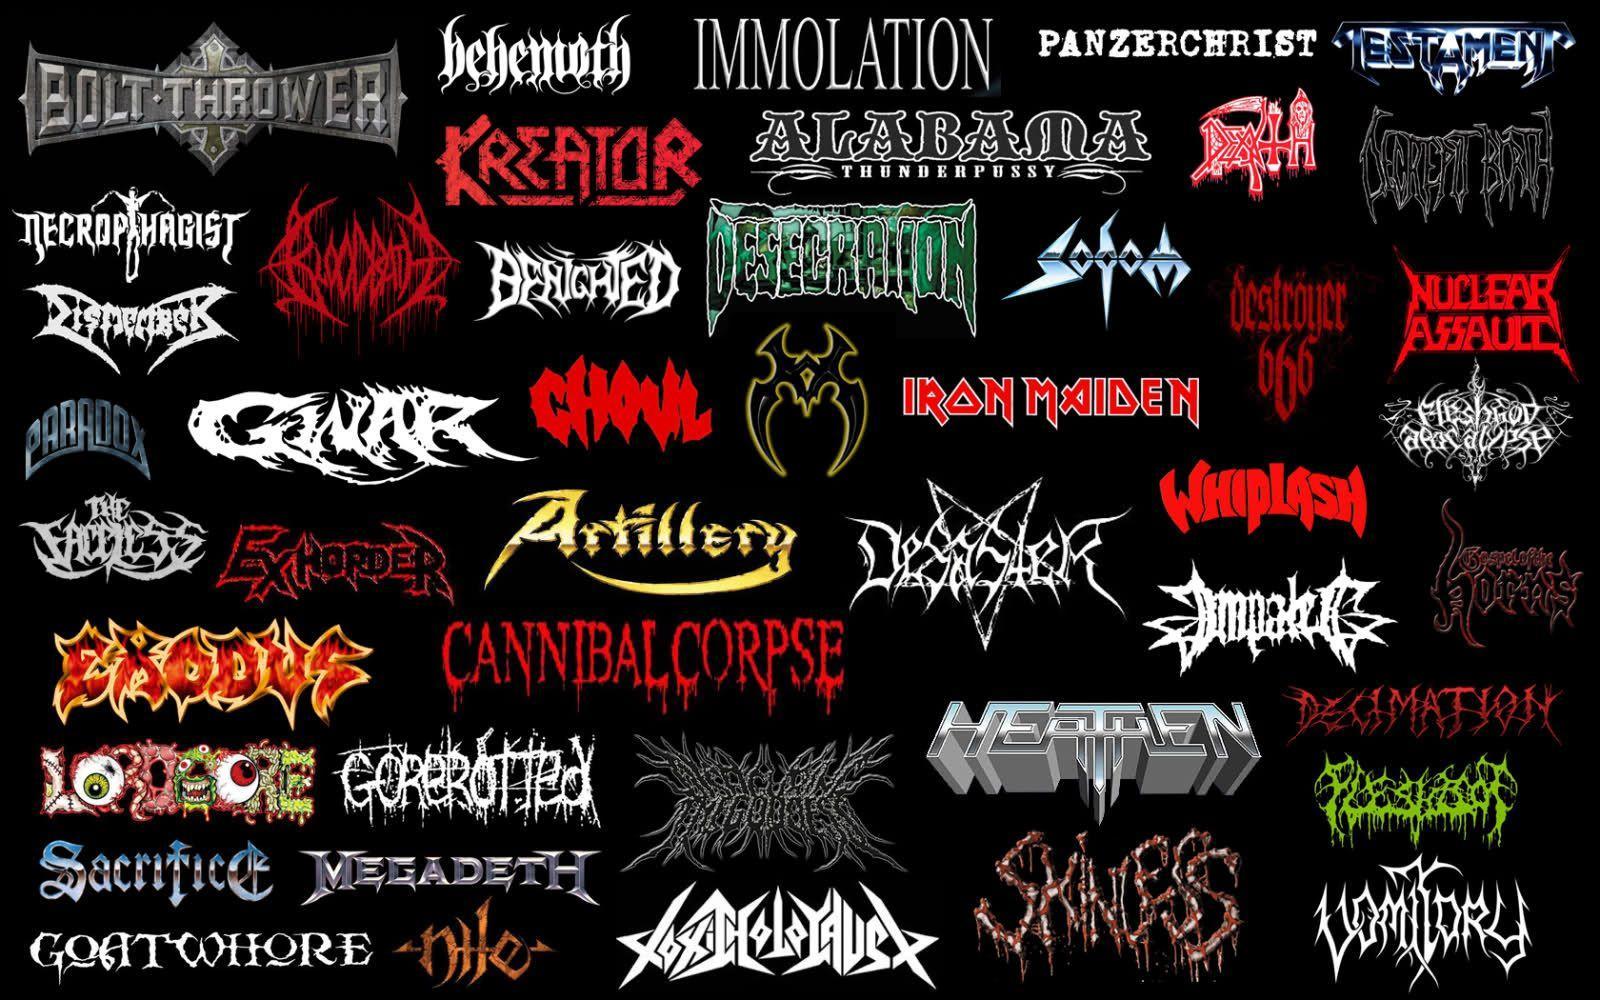 hardcore heavy metal bands